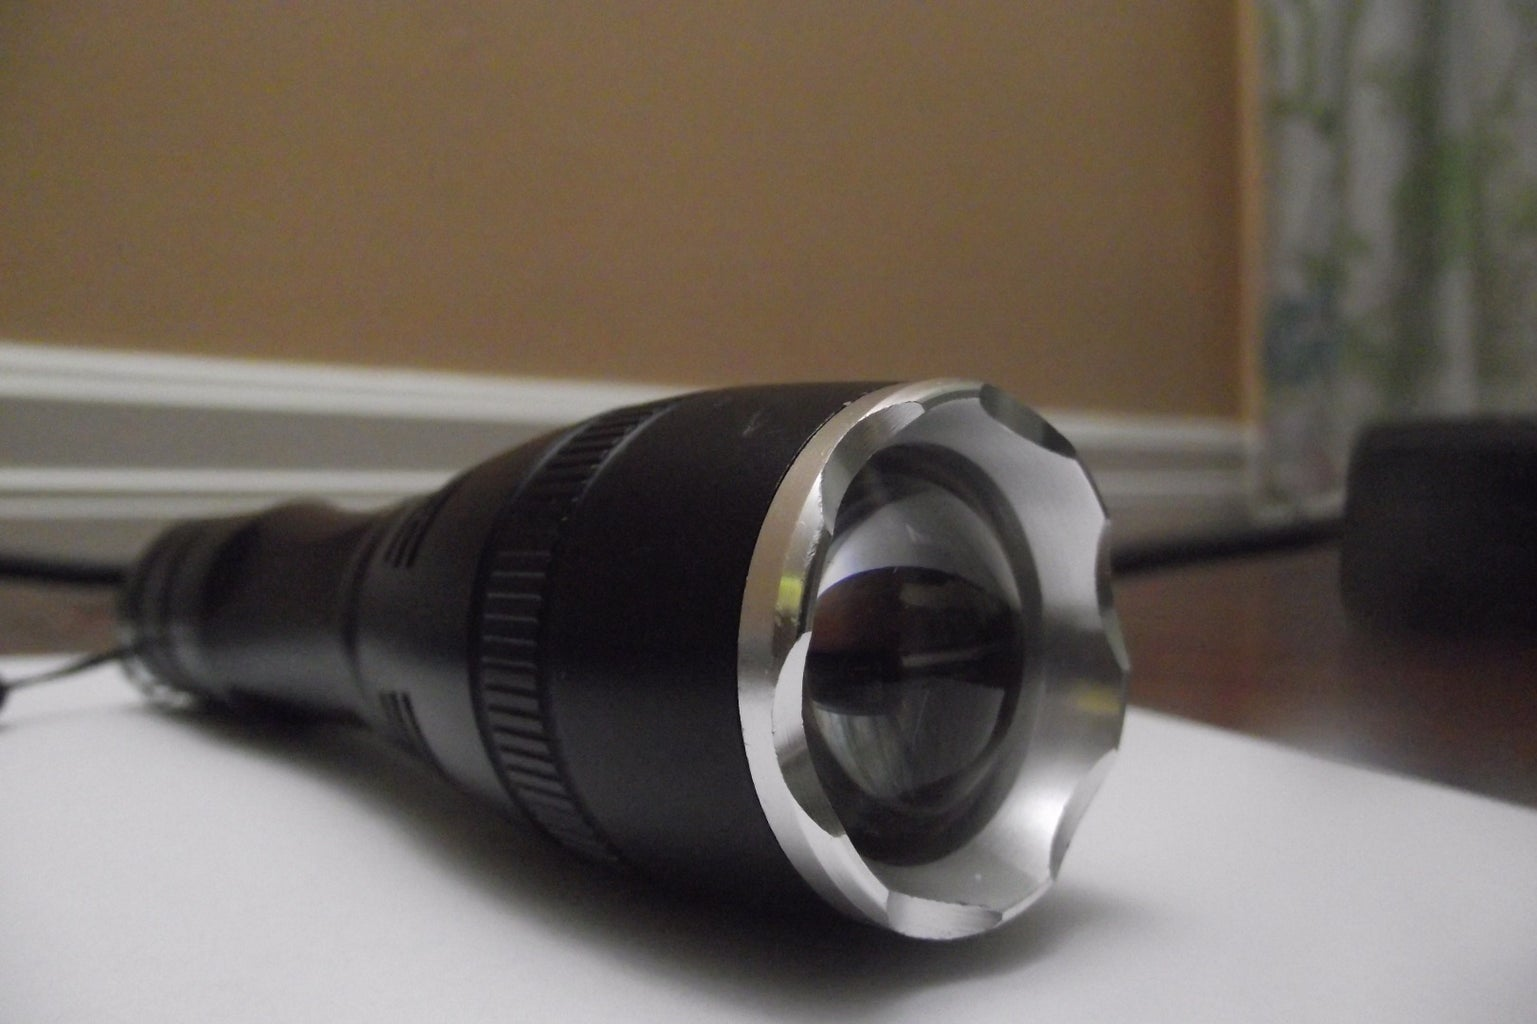 Flashlight Survival Kit